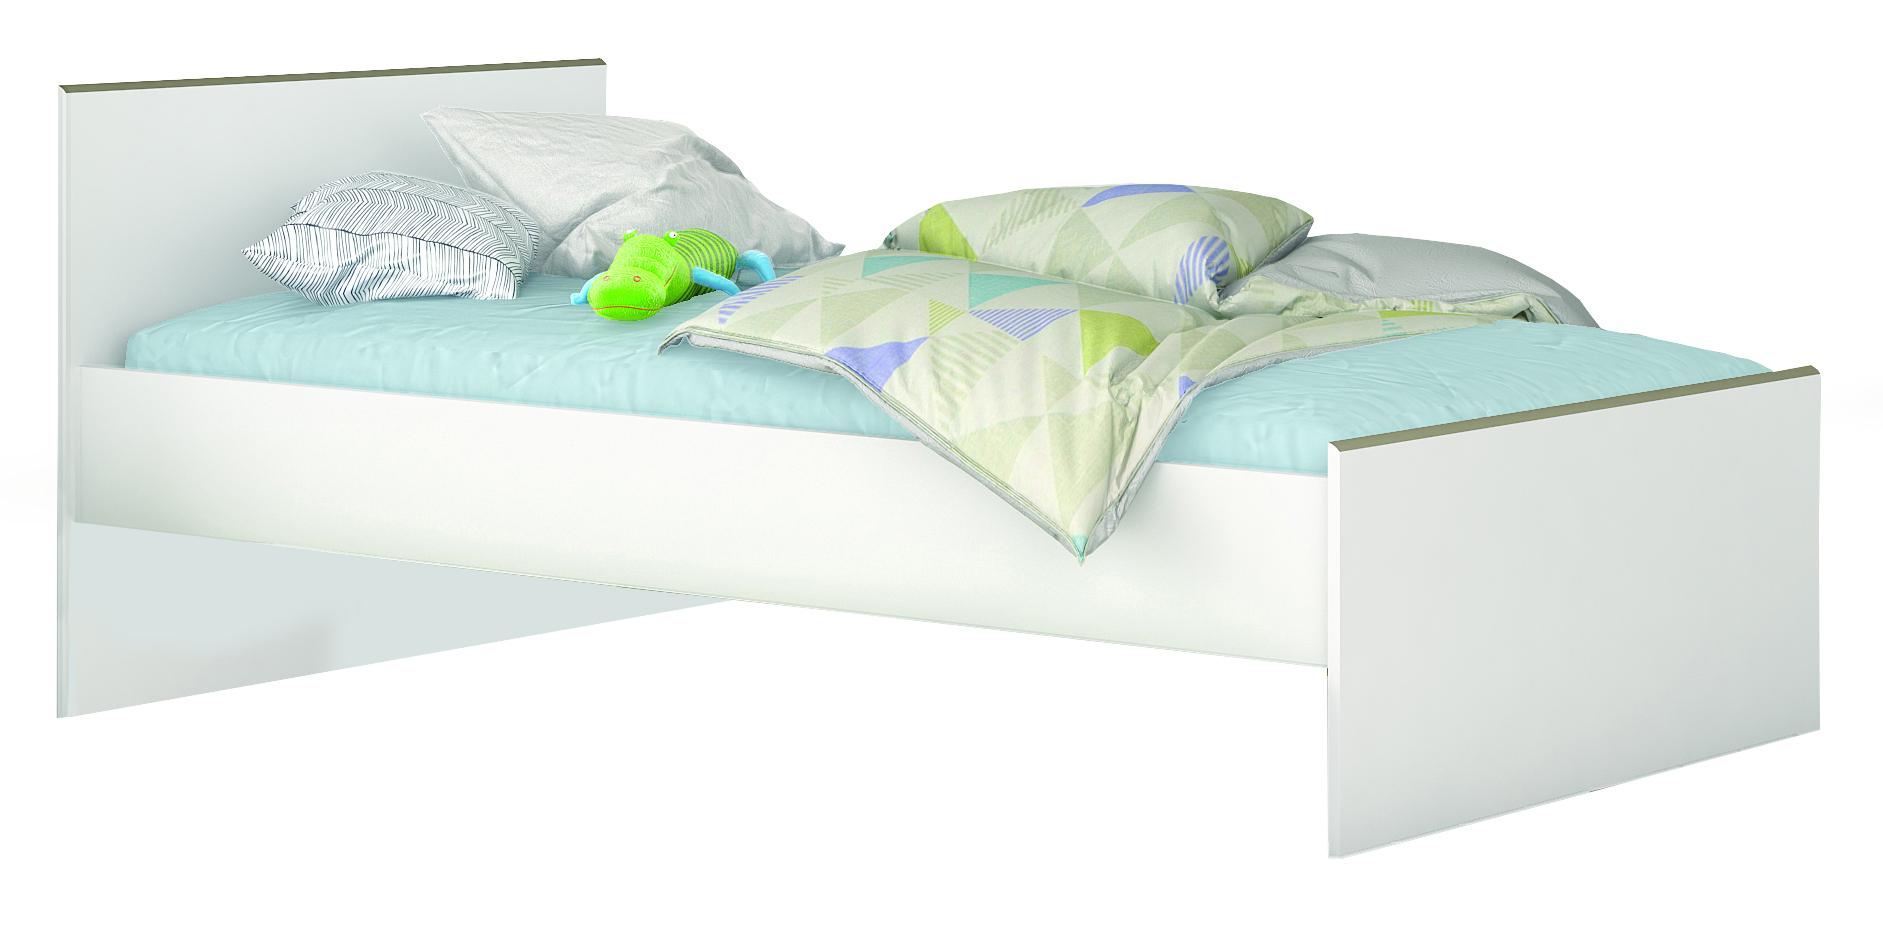 kinderbett jugendbett einzelbett liege prinzessin bett. Black Bedroom Furniture Sets. Home Design Ideas